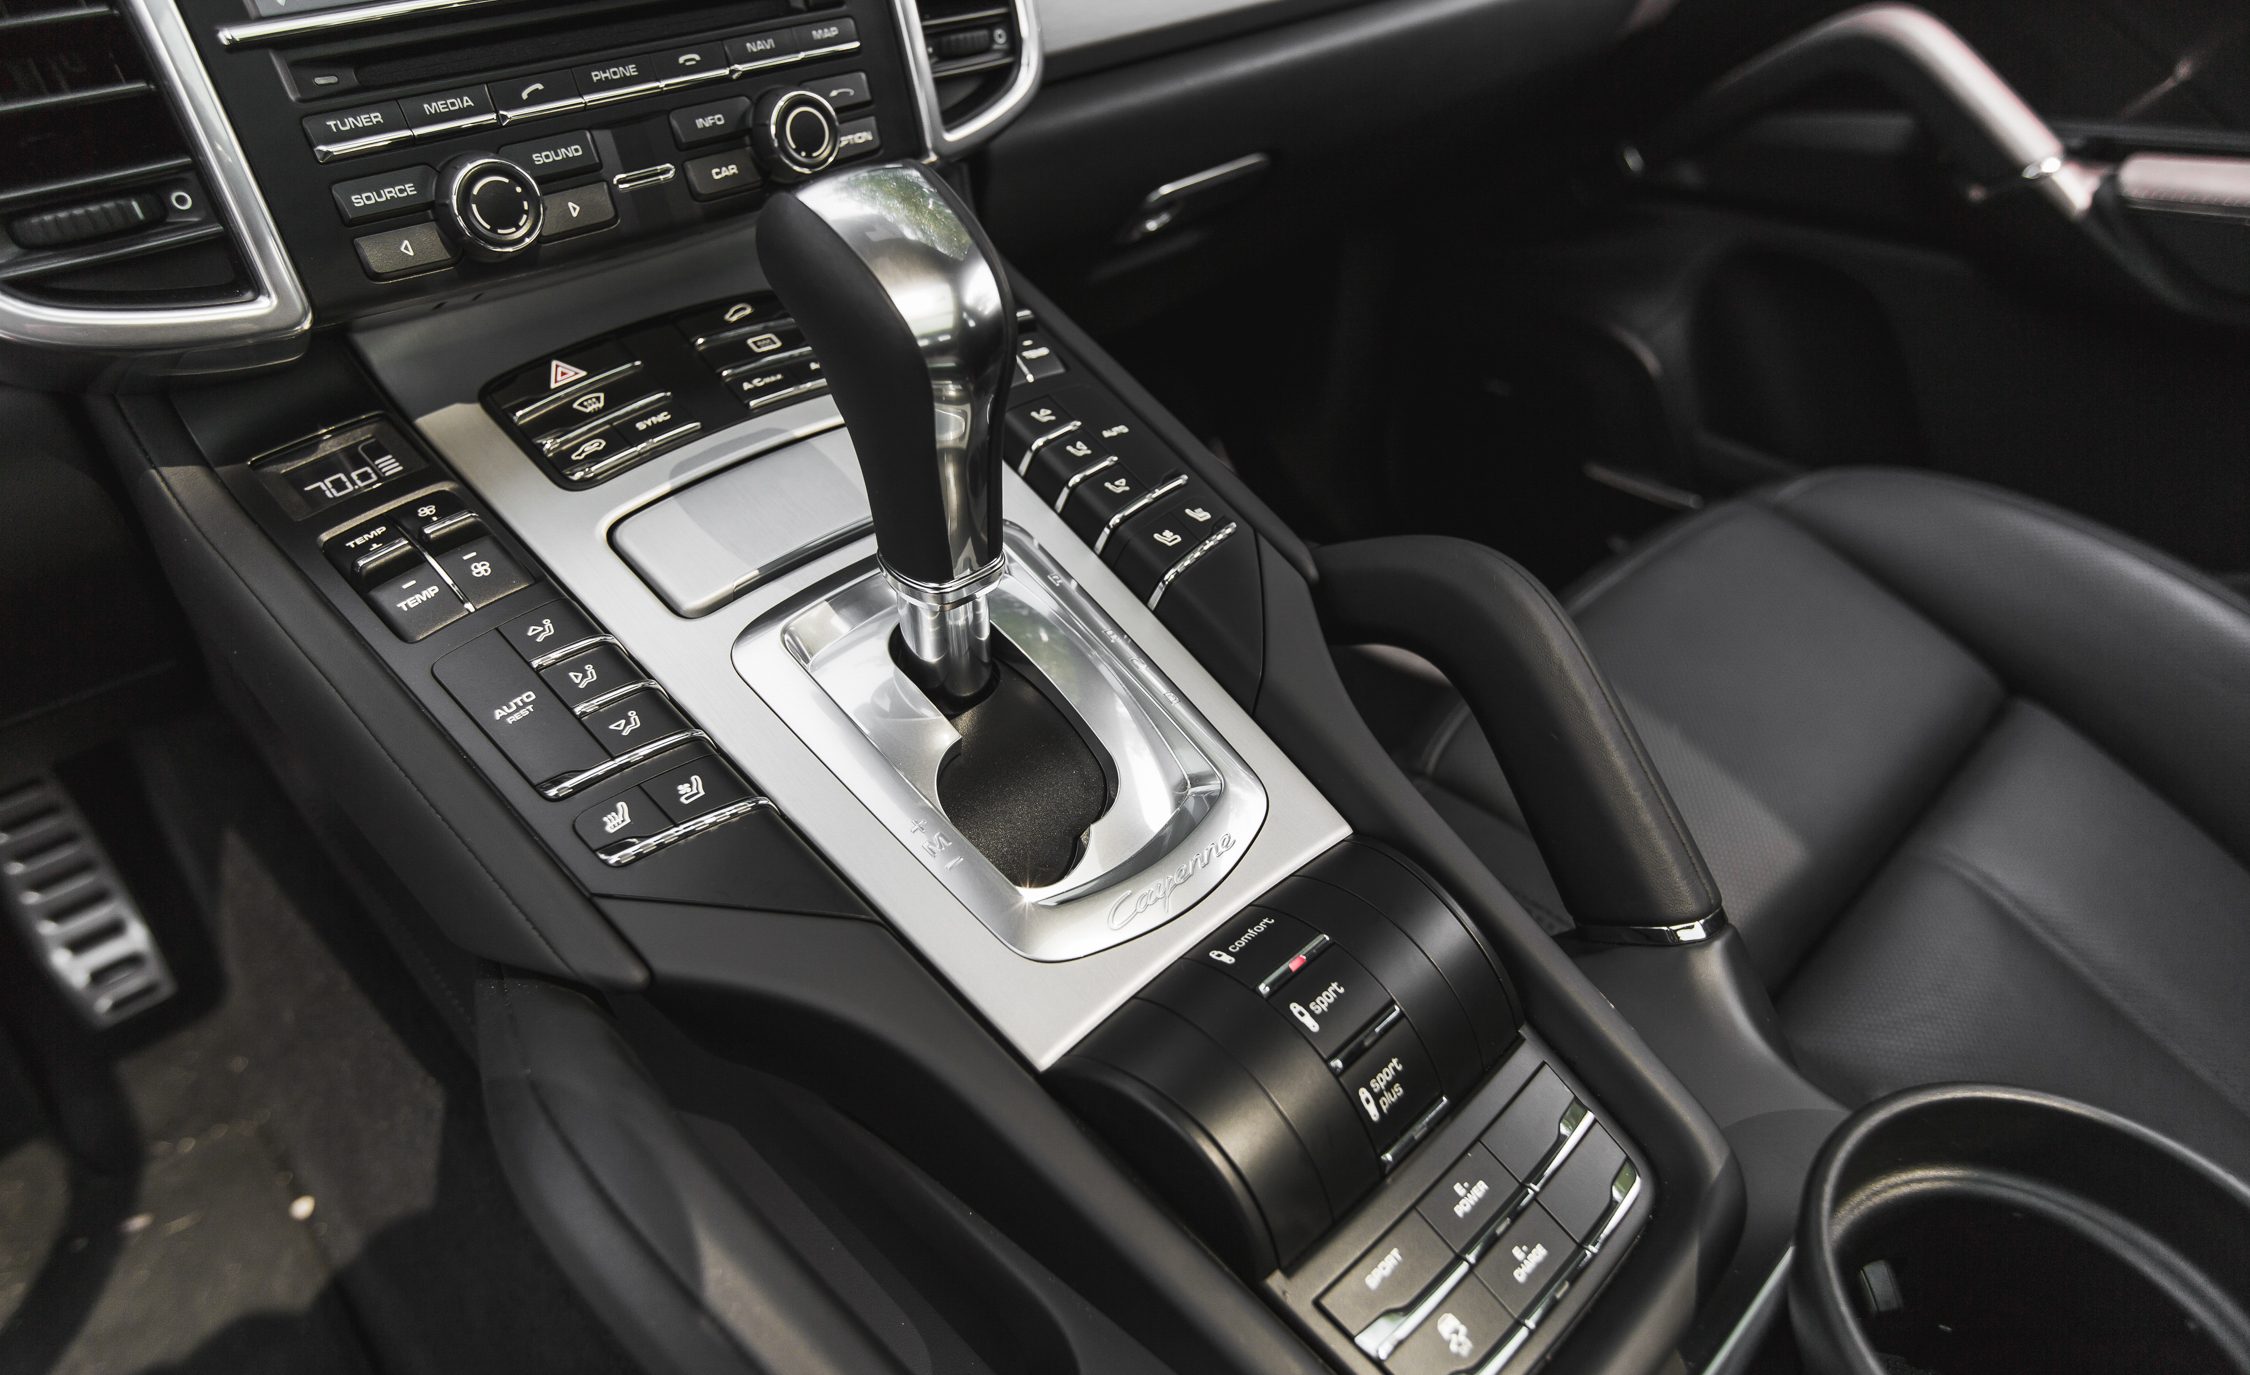 2015 Porsche Cayenne S E-Hybrid Interior Transmission